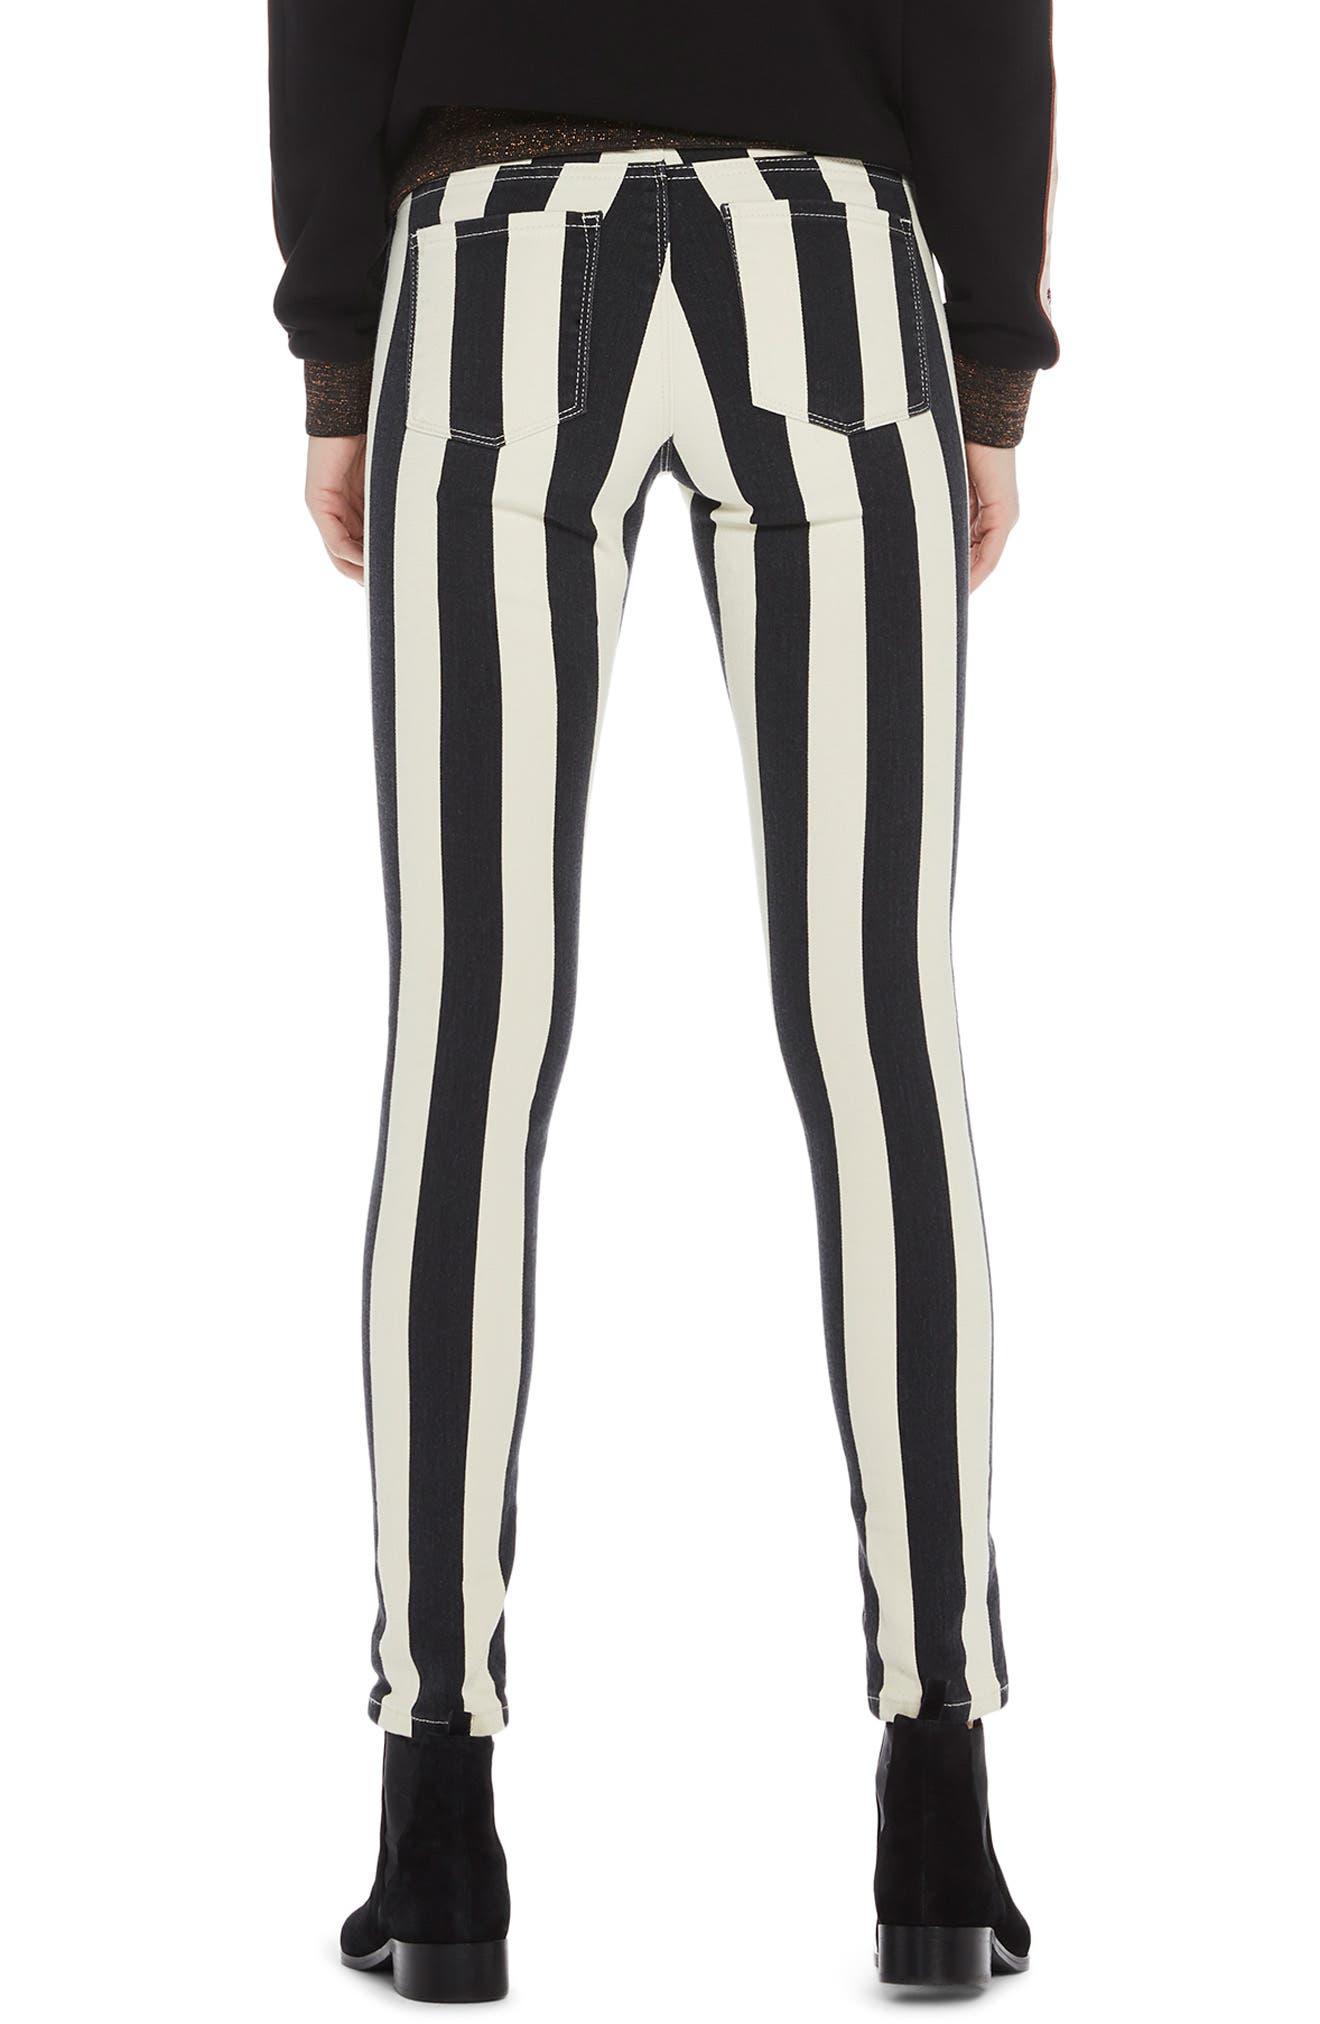 La Bohemienne Skinny Fit Pants,                             Alternate thumbnail 2, color,                             400